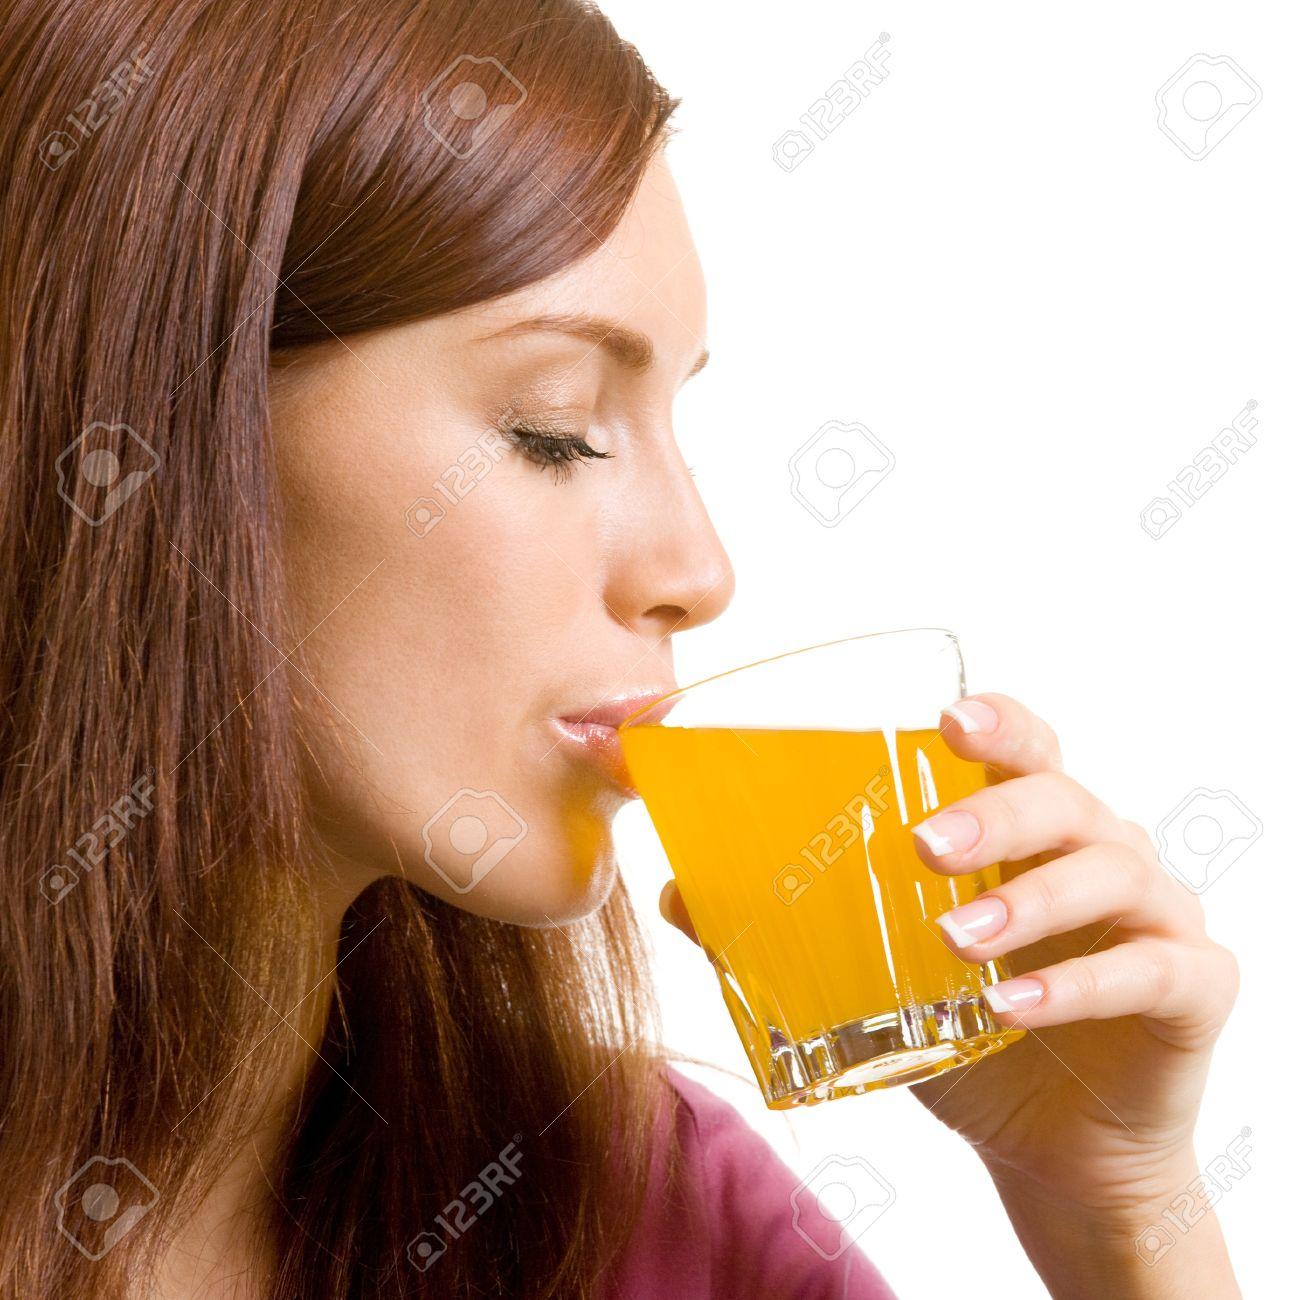 Beautiful woman drinking juice, isolated over white background Stock Photo - 15025653